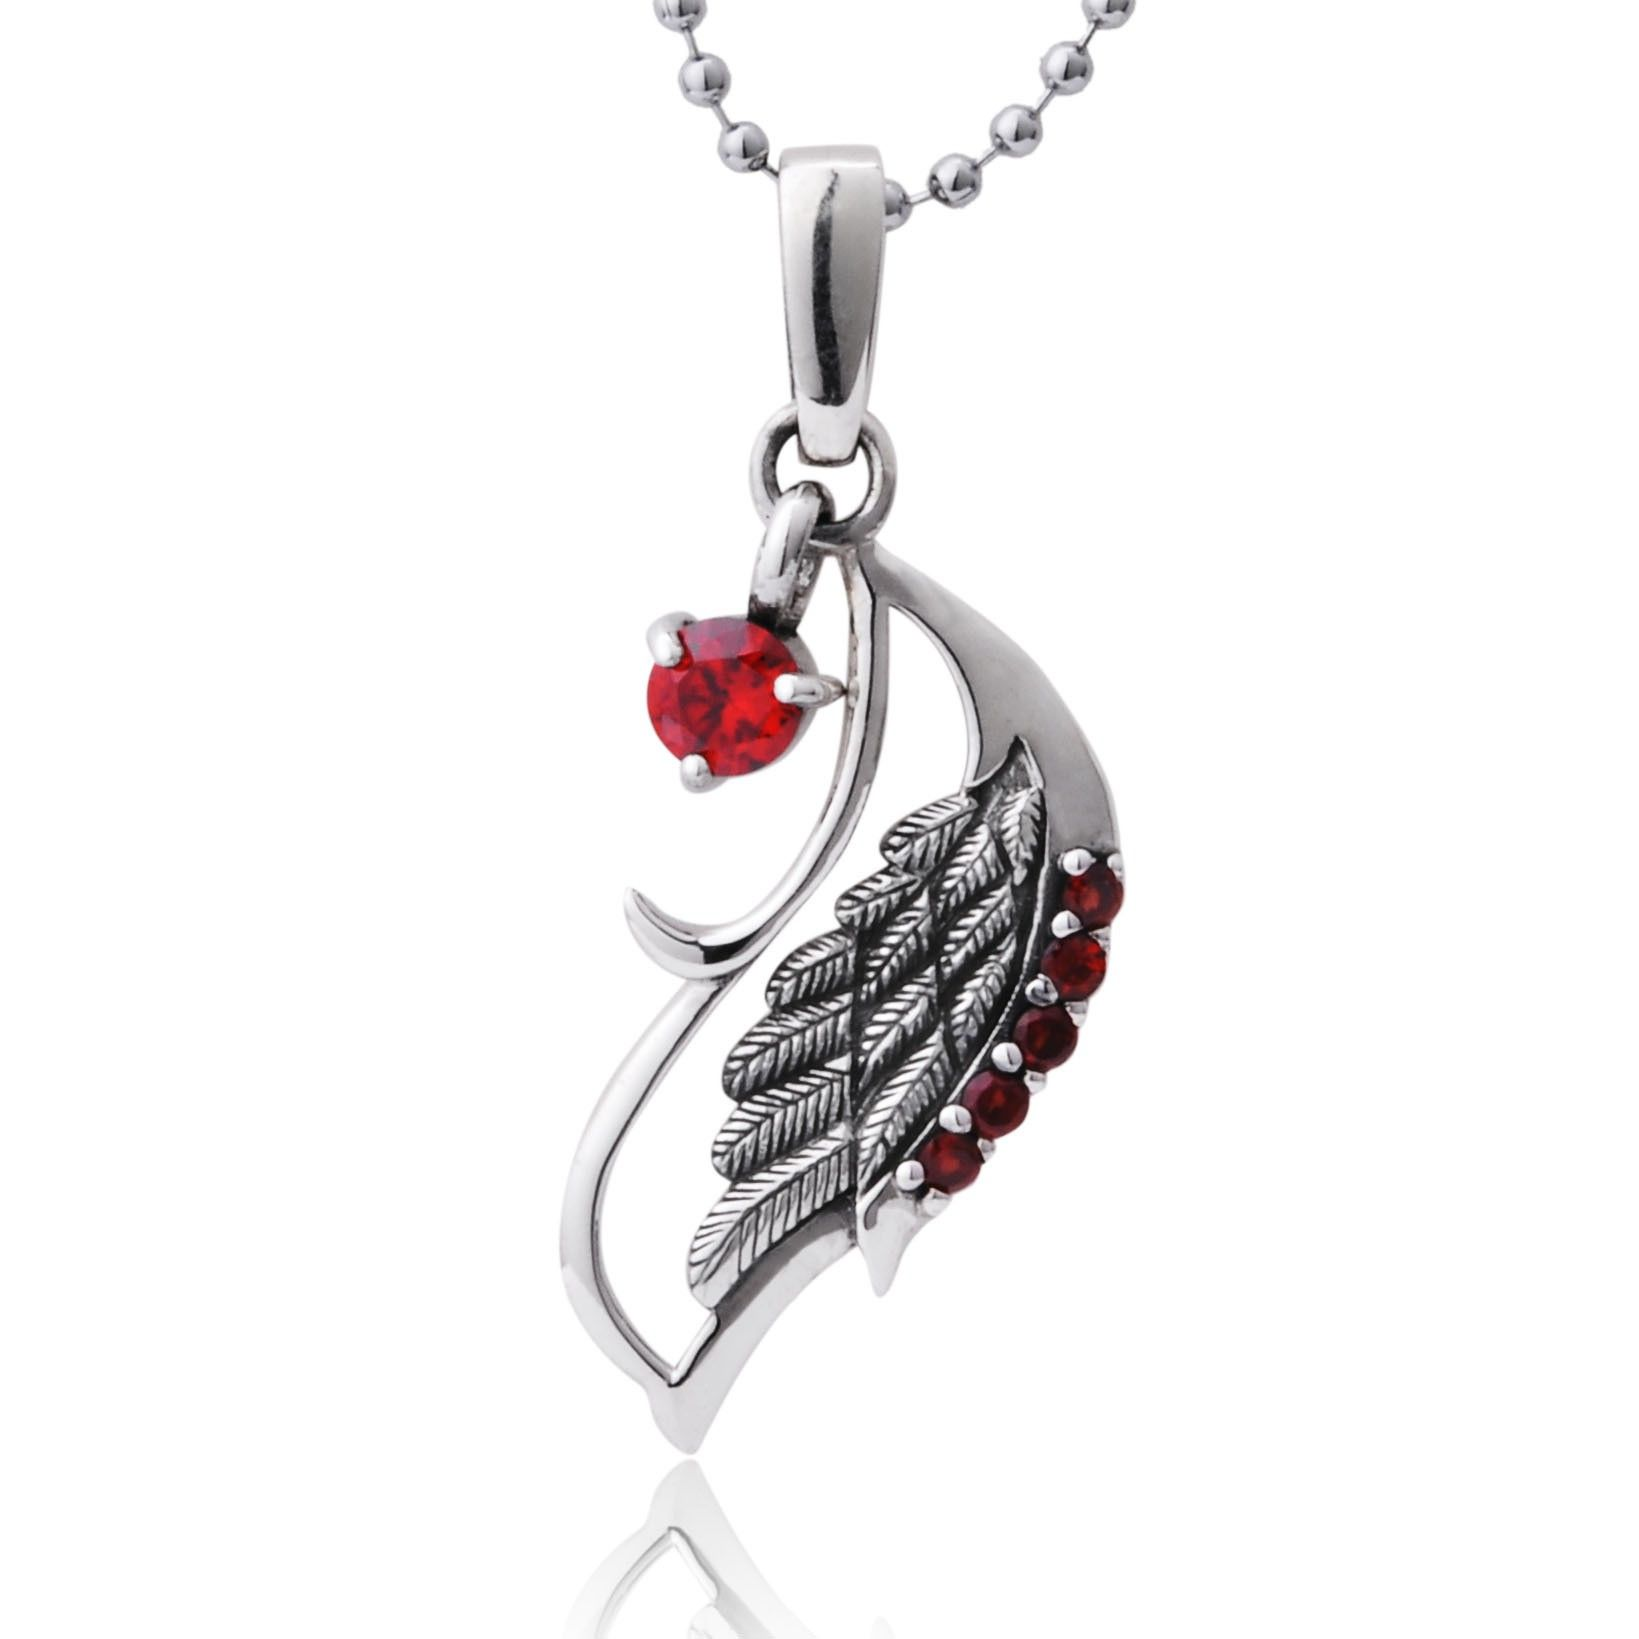 Peacock wing 925 sterling silver diamond pendant necklace for peacock wing 925 sterling silver diamond pendant necklace for women aloadofball Choice Image